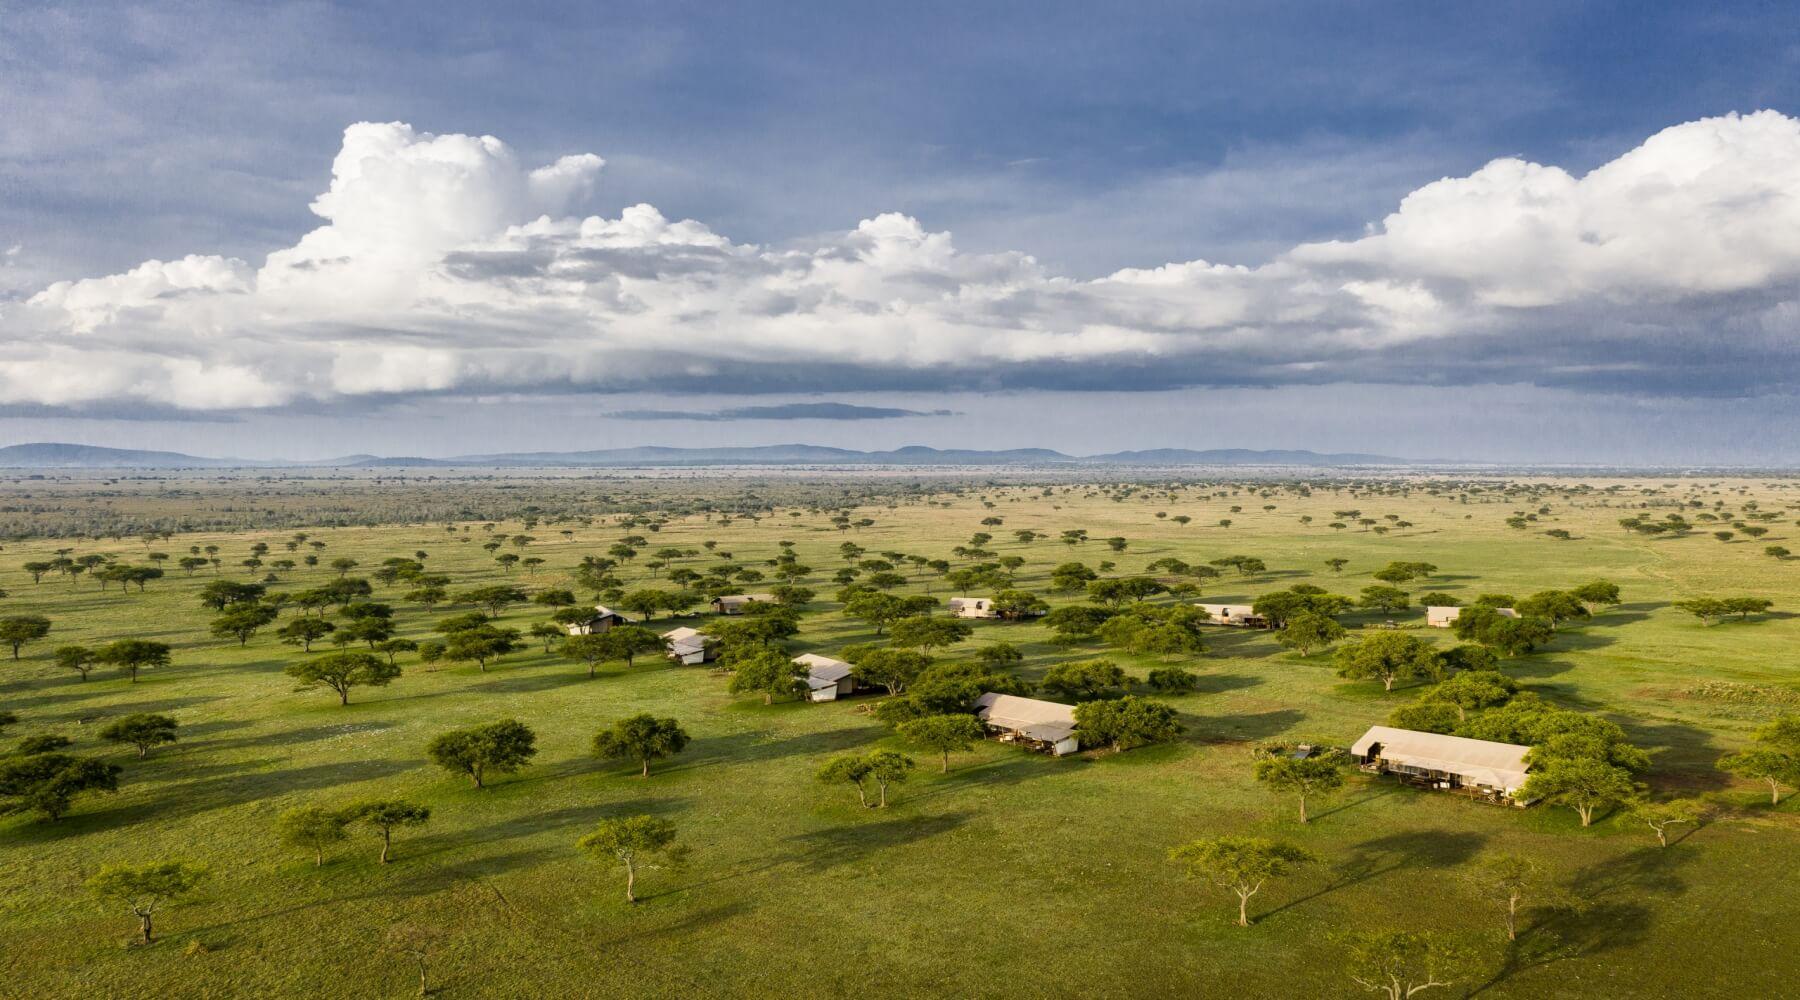 Singita Sabora Tented Camp, Tanzania